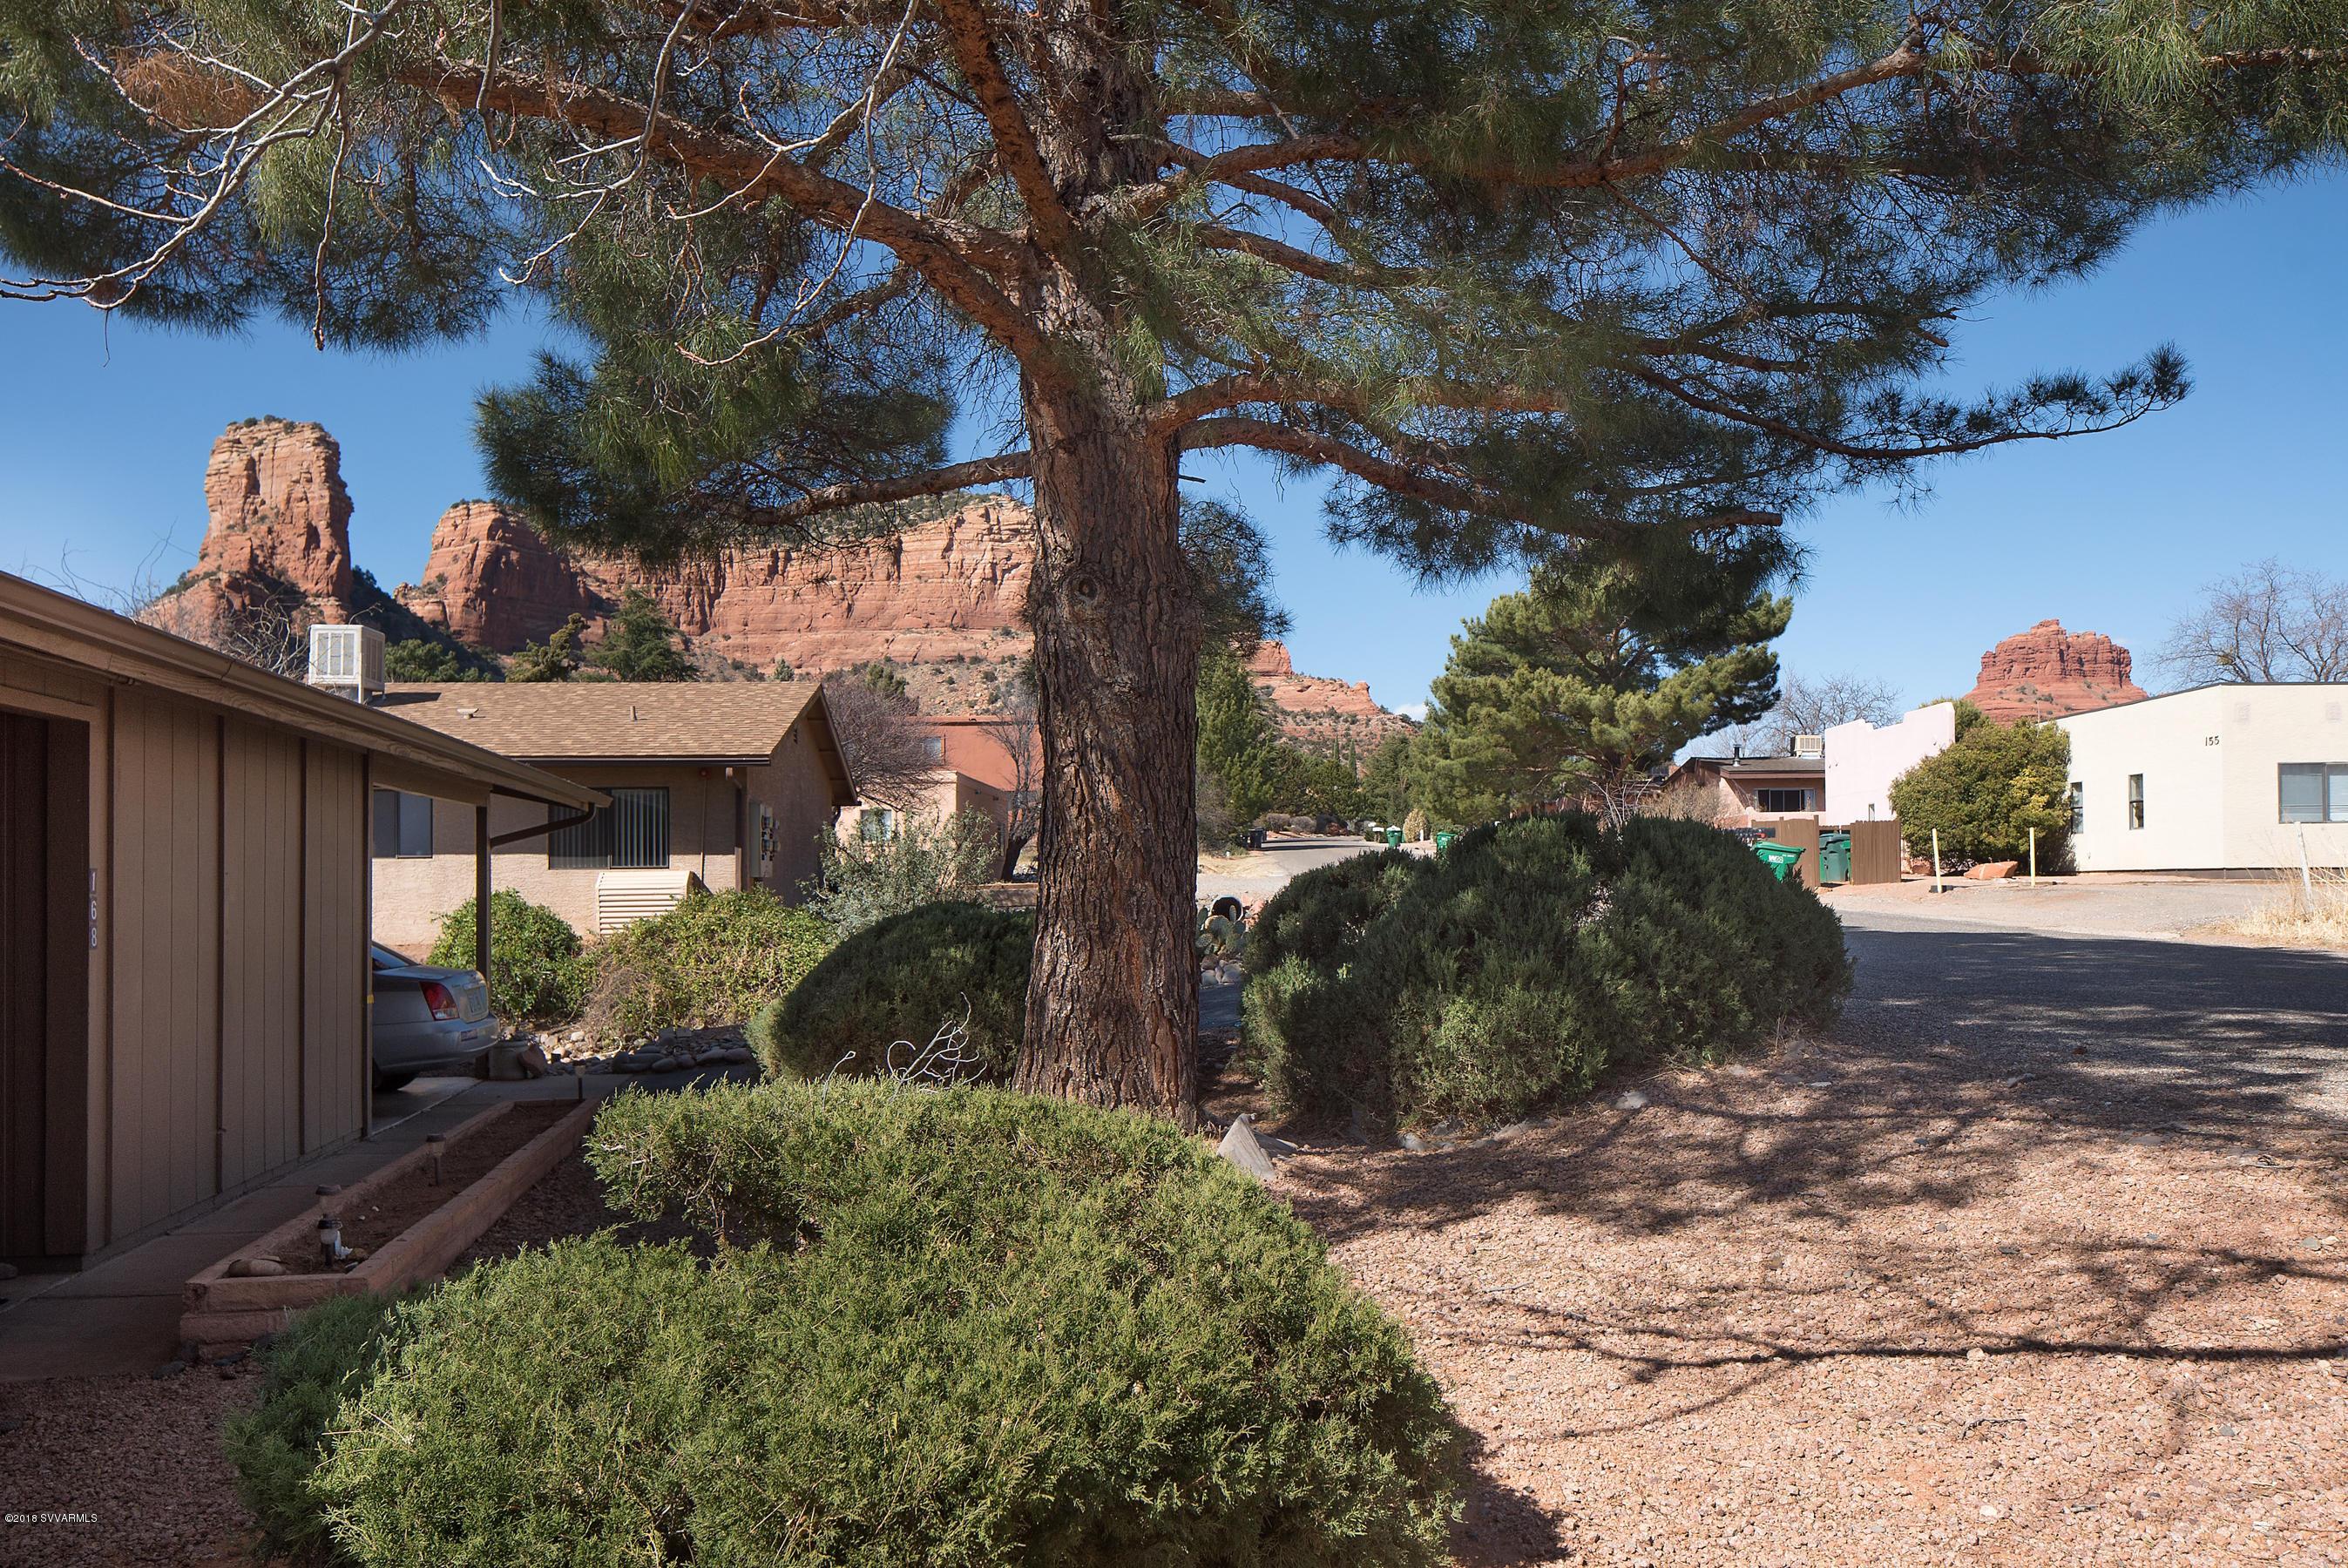 168/170 Sugarloaf St Sedona, AZ 86351